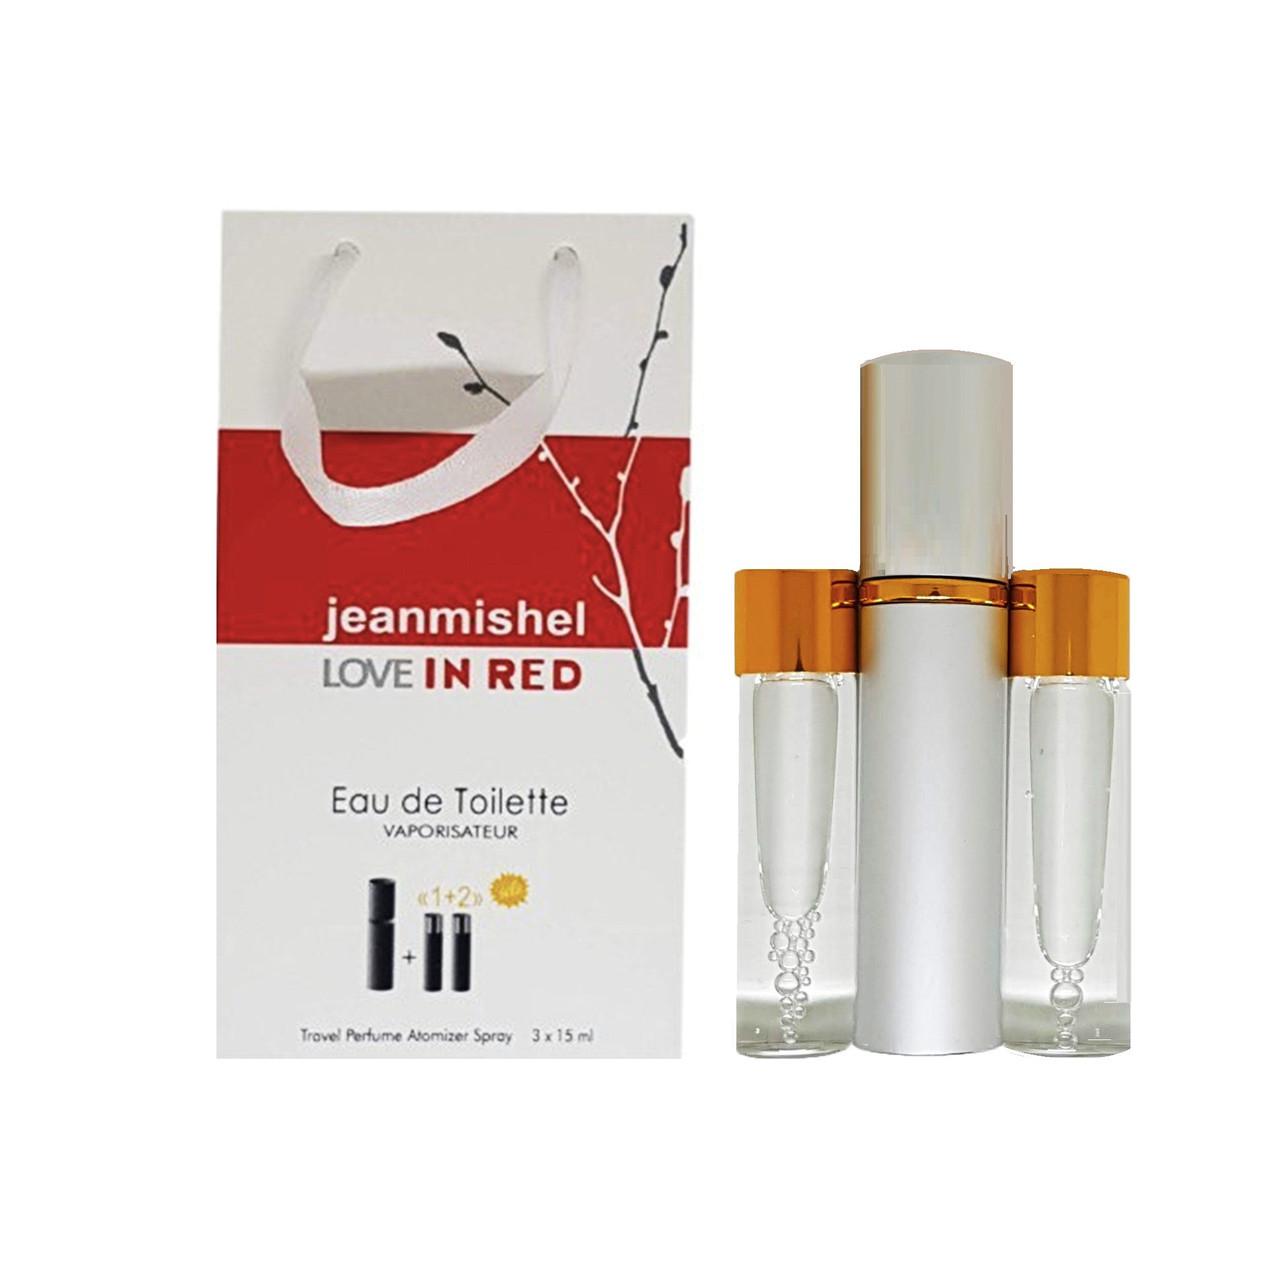 Jeanmishel Love In Red (1) 3 x 15 ml